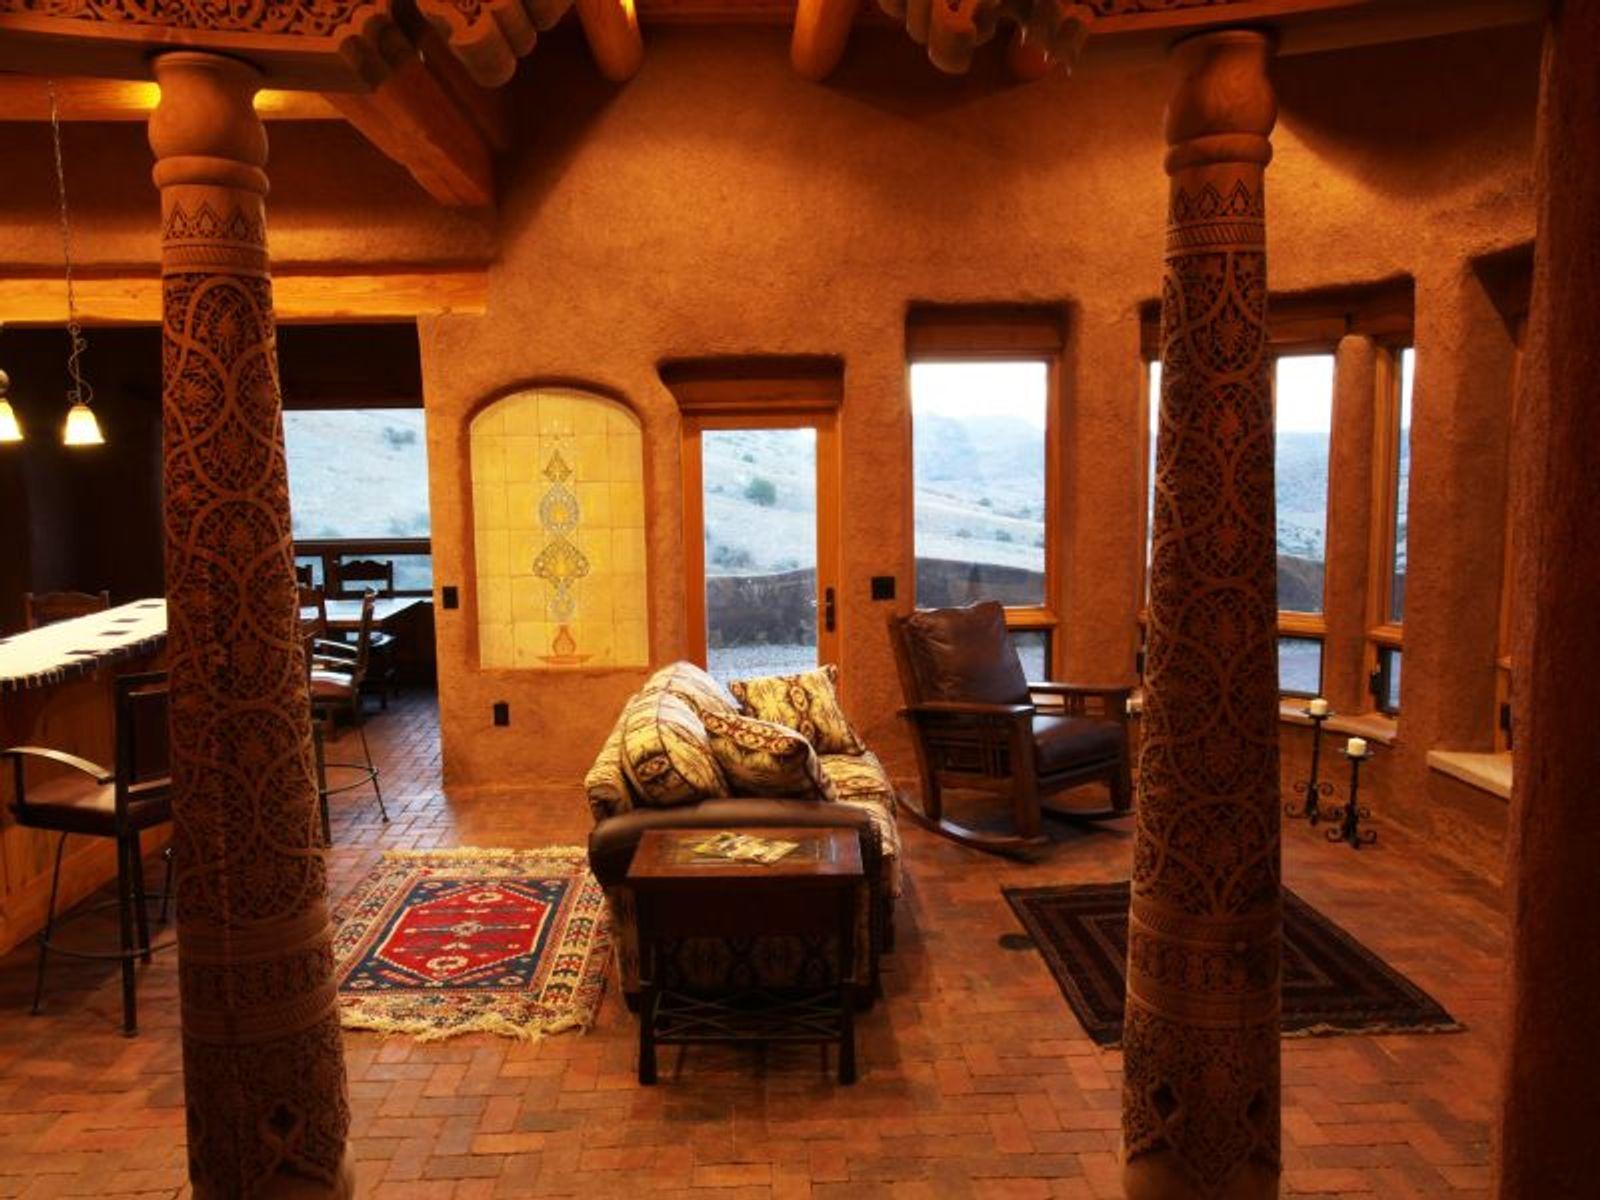 Main House:  Great Room - Uzbek tile mural; Pendle